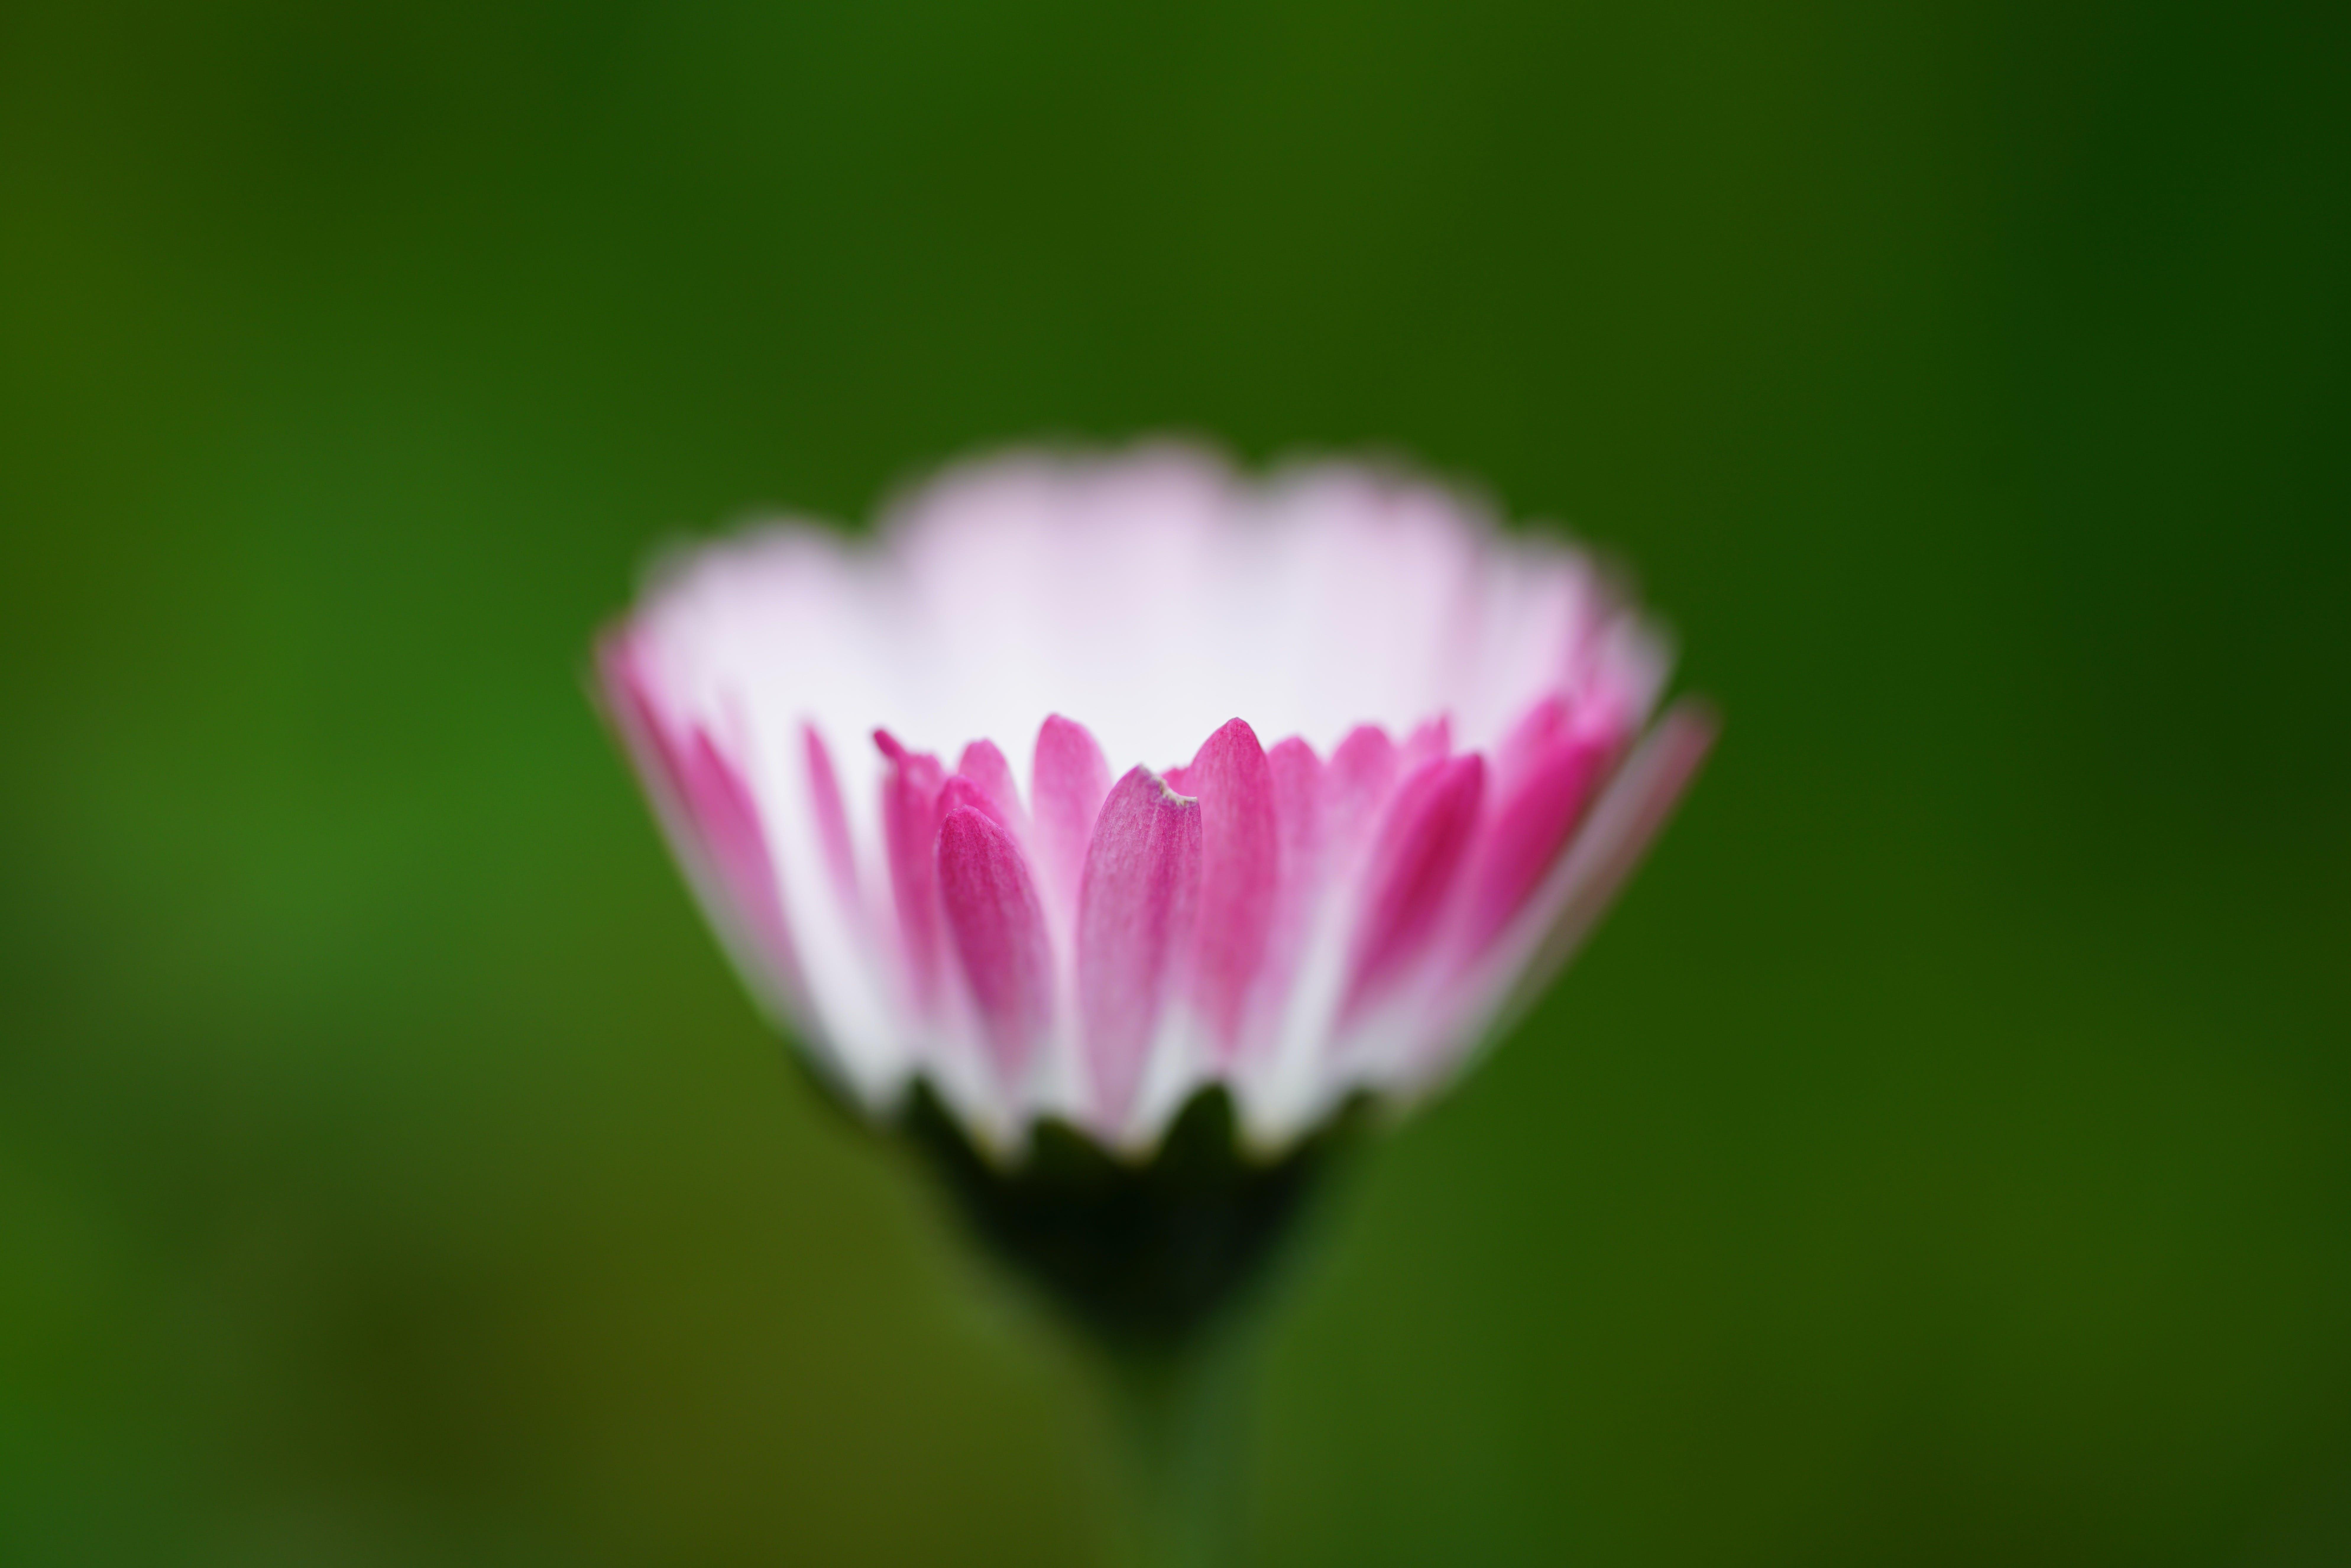 Tilt Shift Photography of Pink and White Multi Petaled Flower